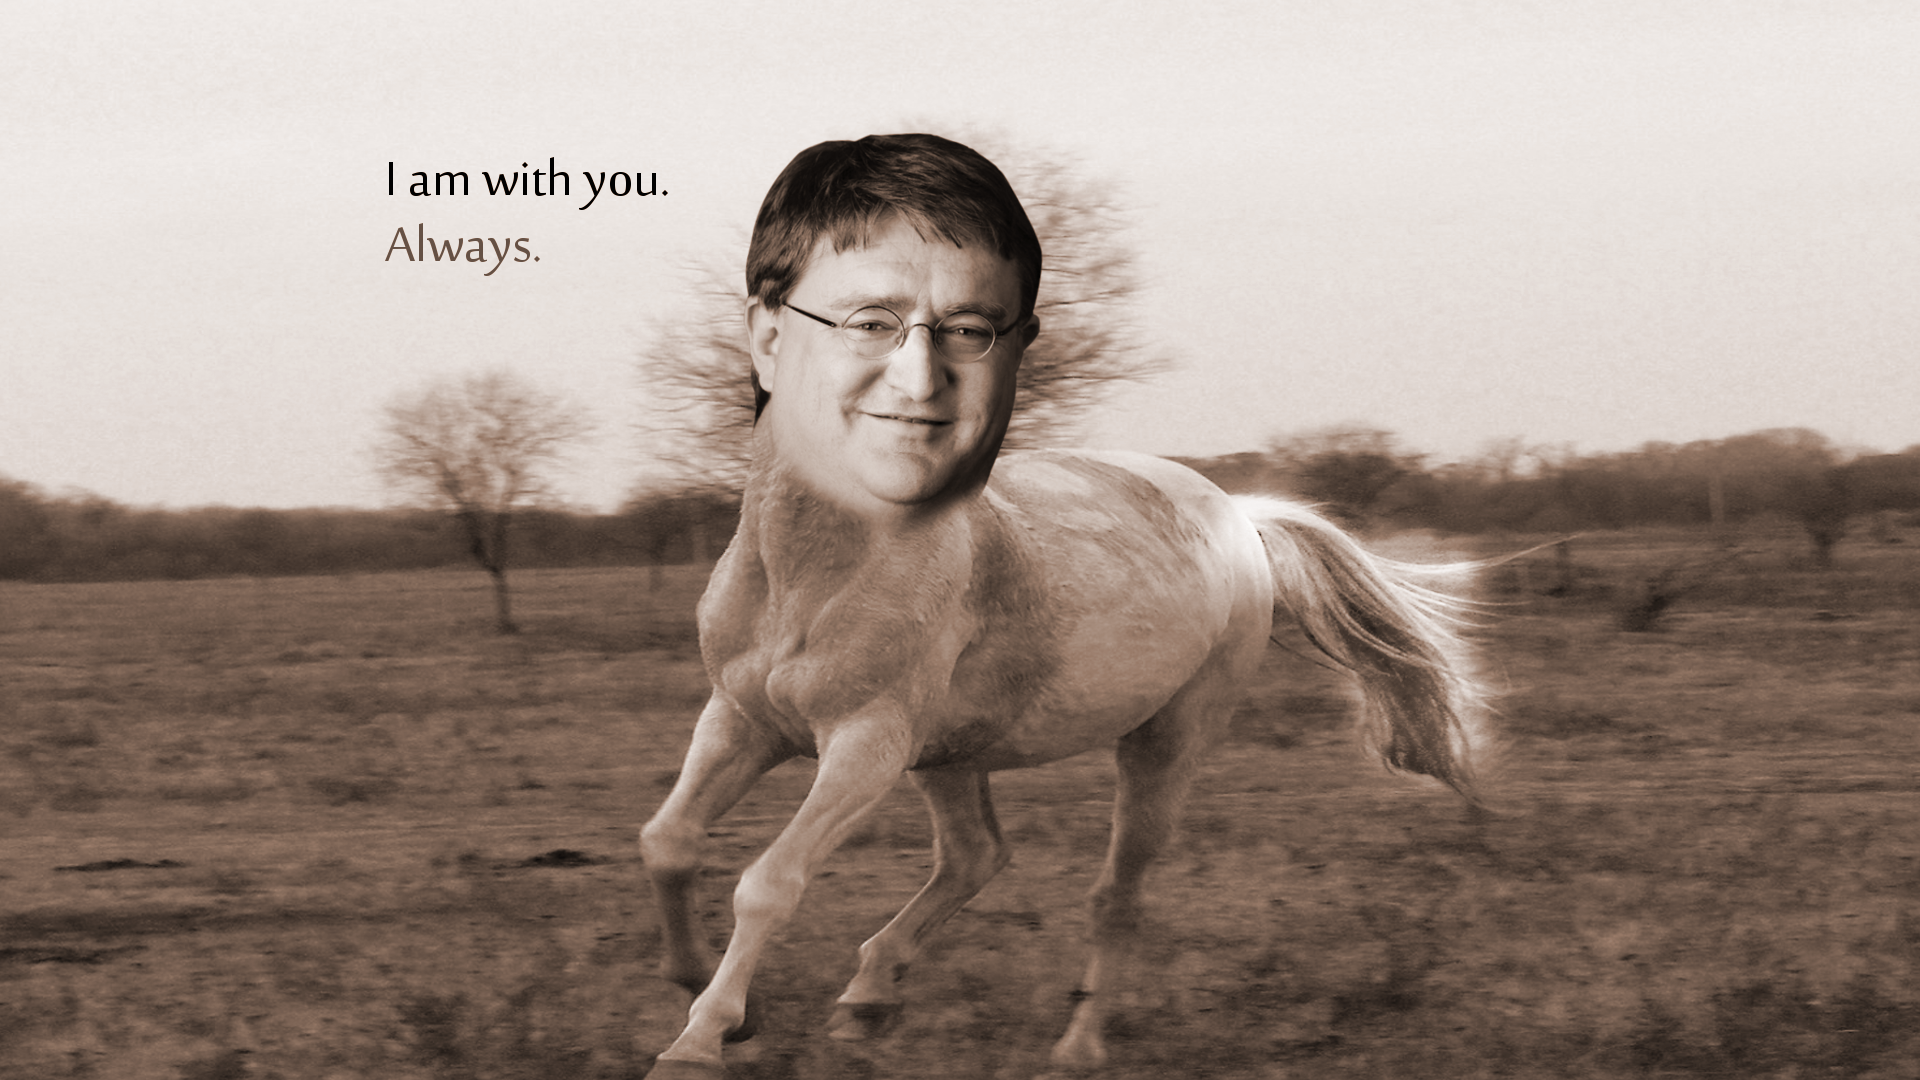 Gabe Newell Wallpaper - WallpaperSafari